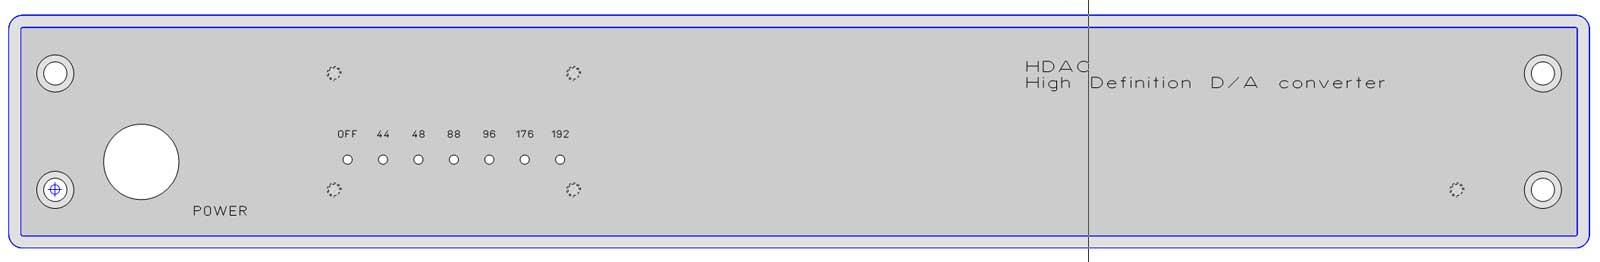 HDAC: pannello frontale 35261165176_fbc4fab7c9_o_d